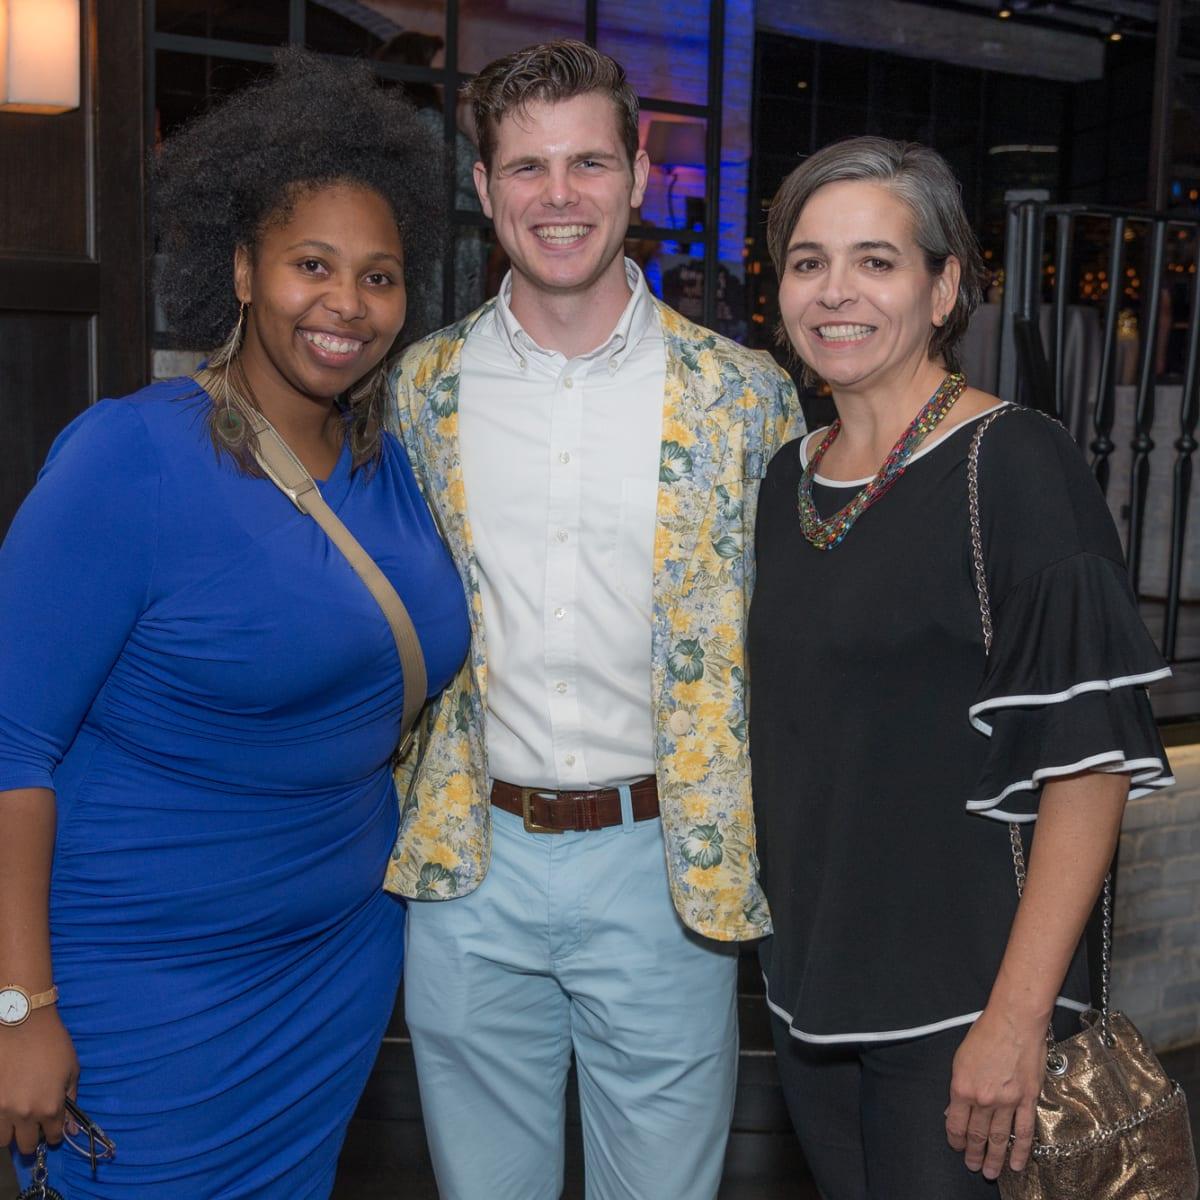 WITS Gala 2018: Deborah Mouton, Jackson Neal, Debbie McNulty